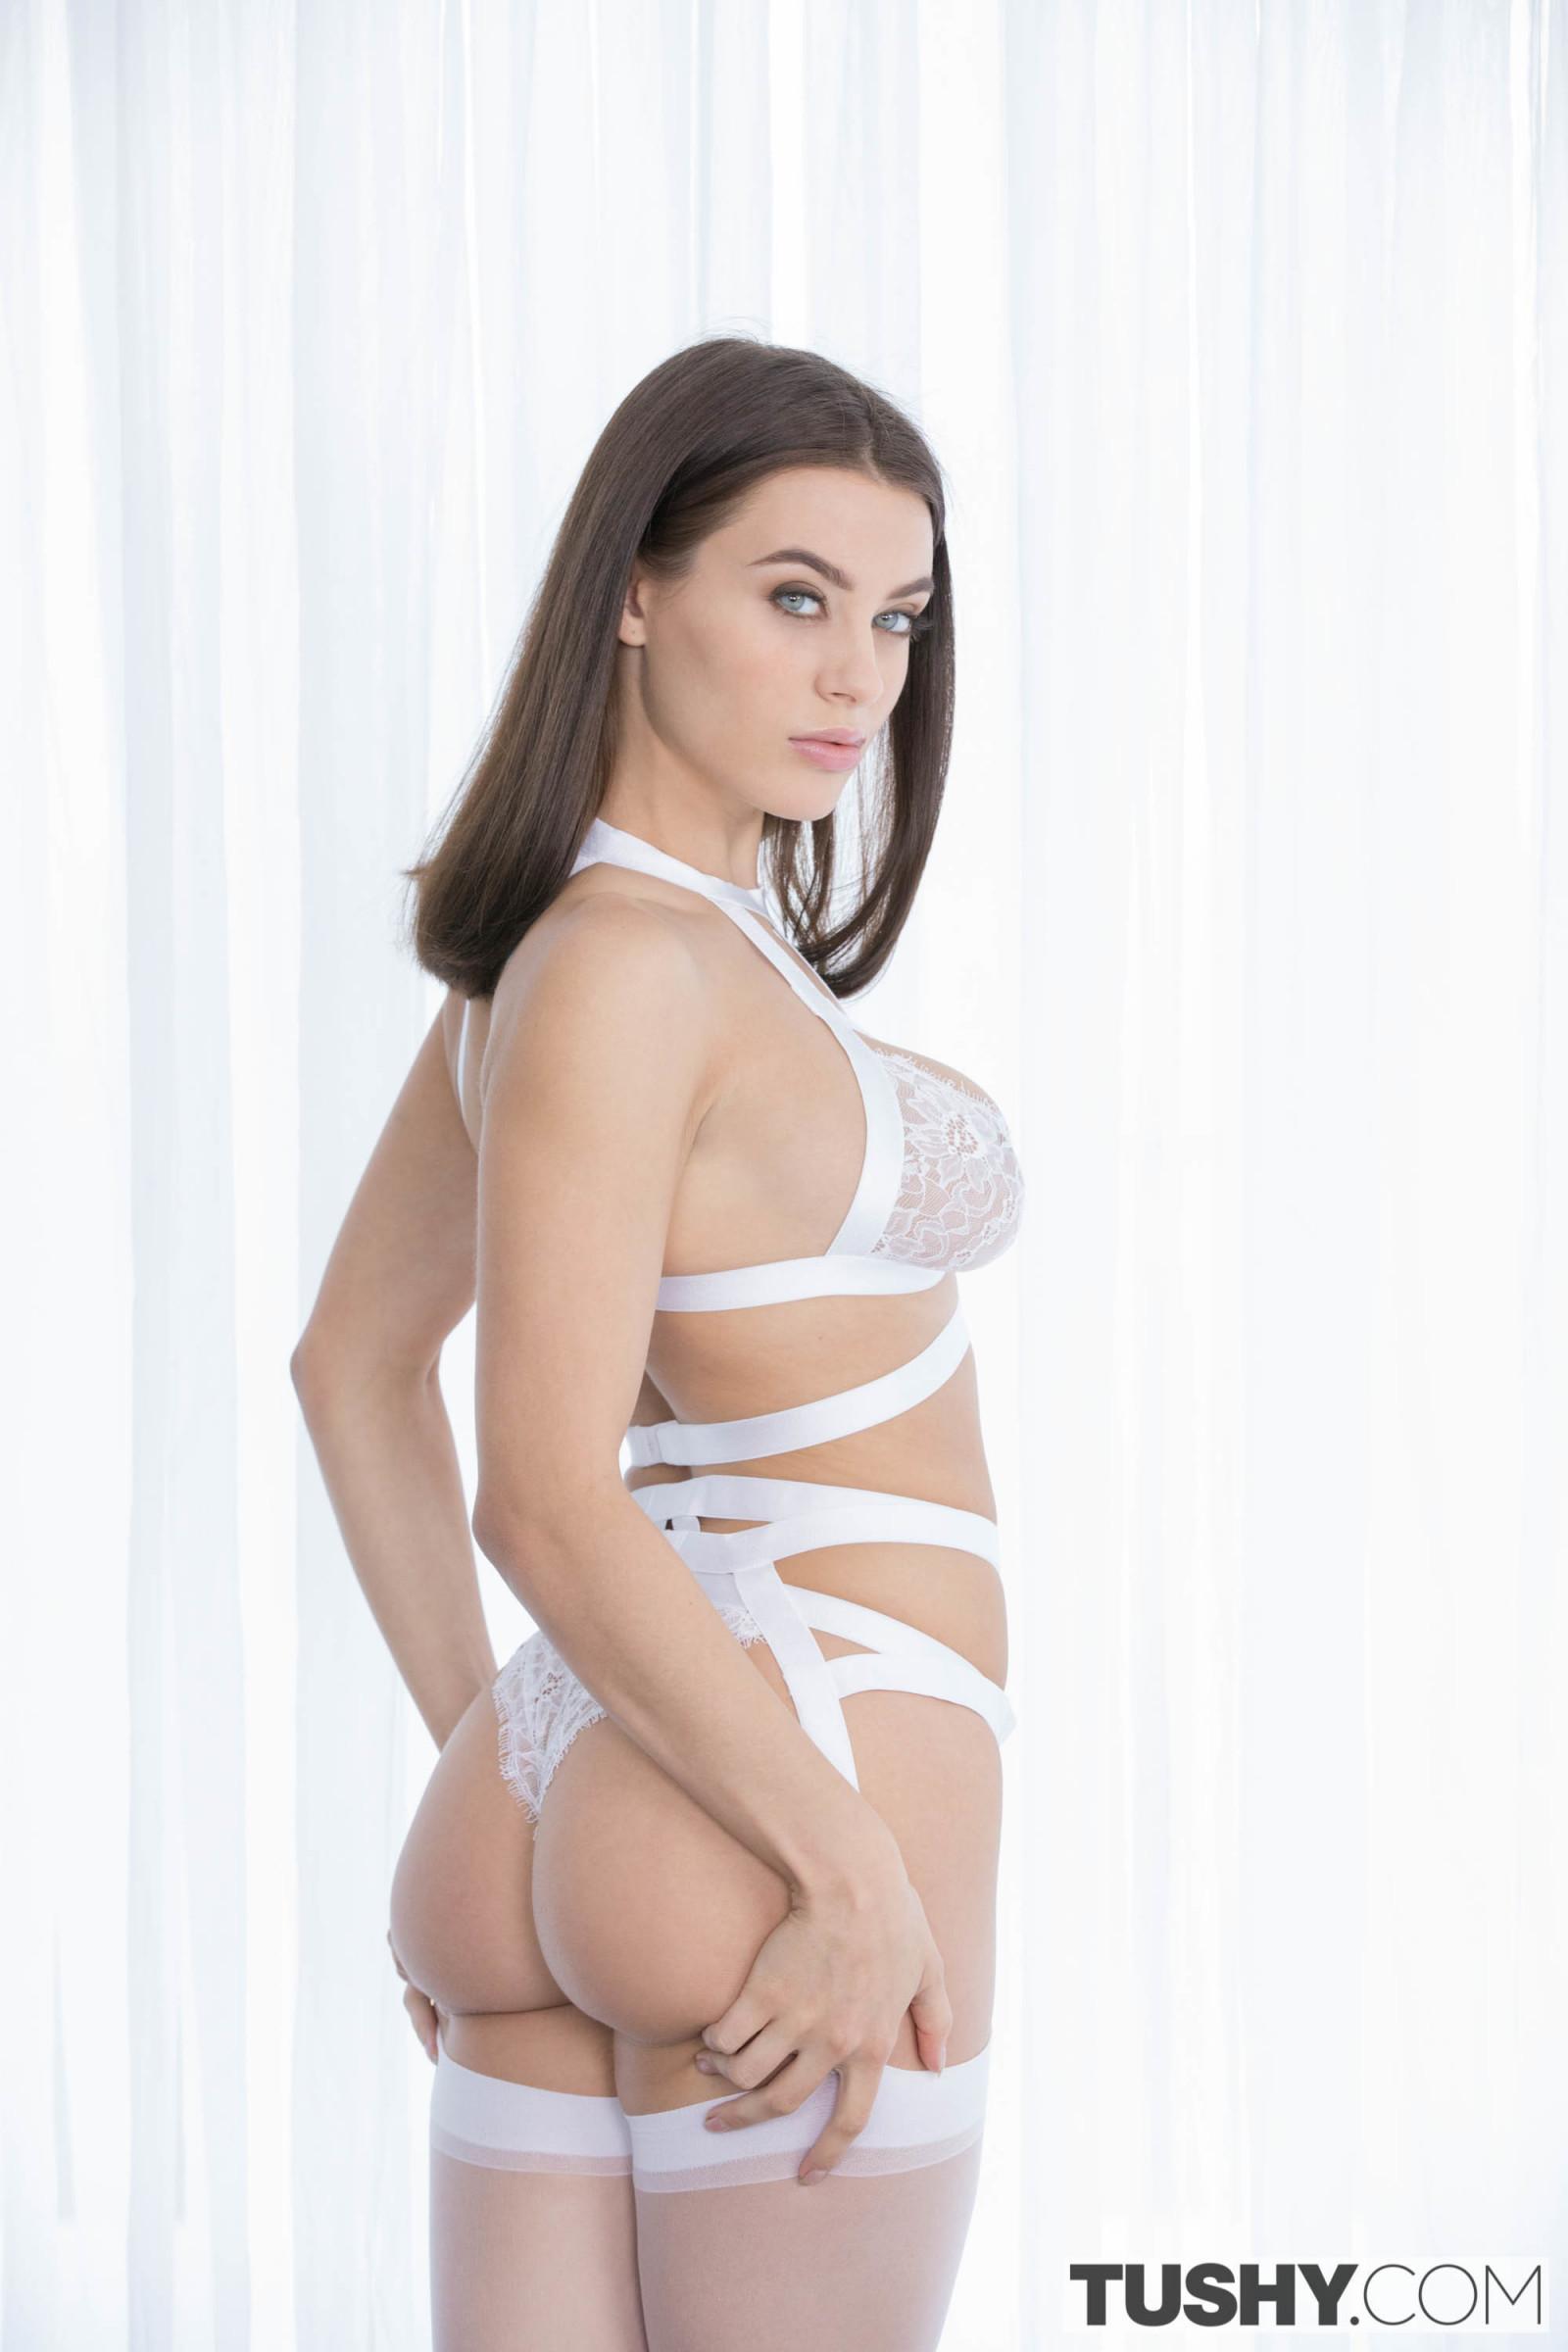 Lana rhoades lingerie porn